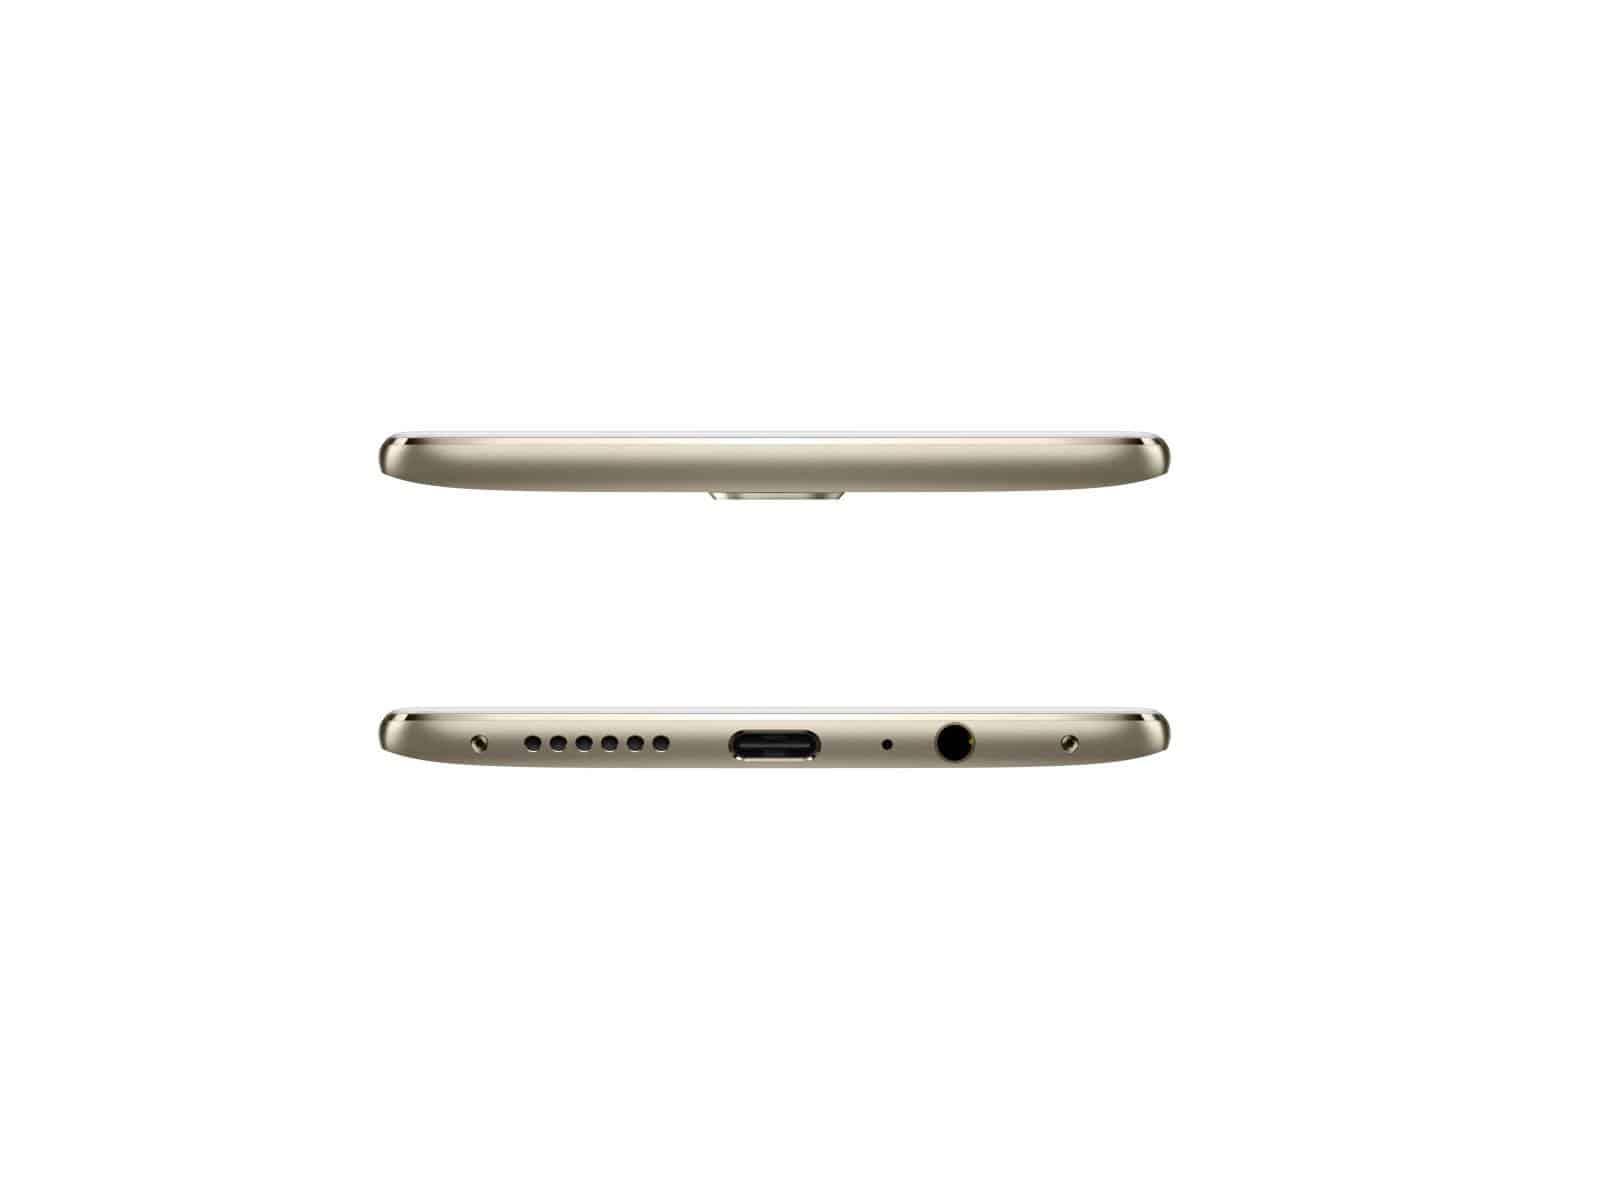 OnePlus 3 Soft Gold Press AH 23